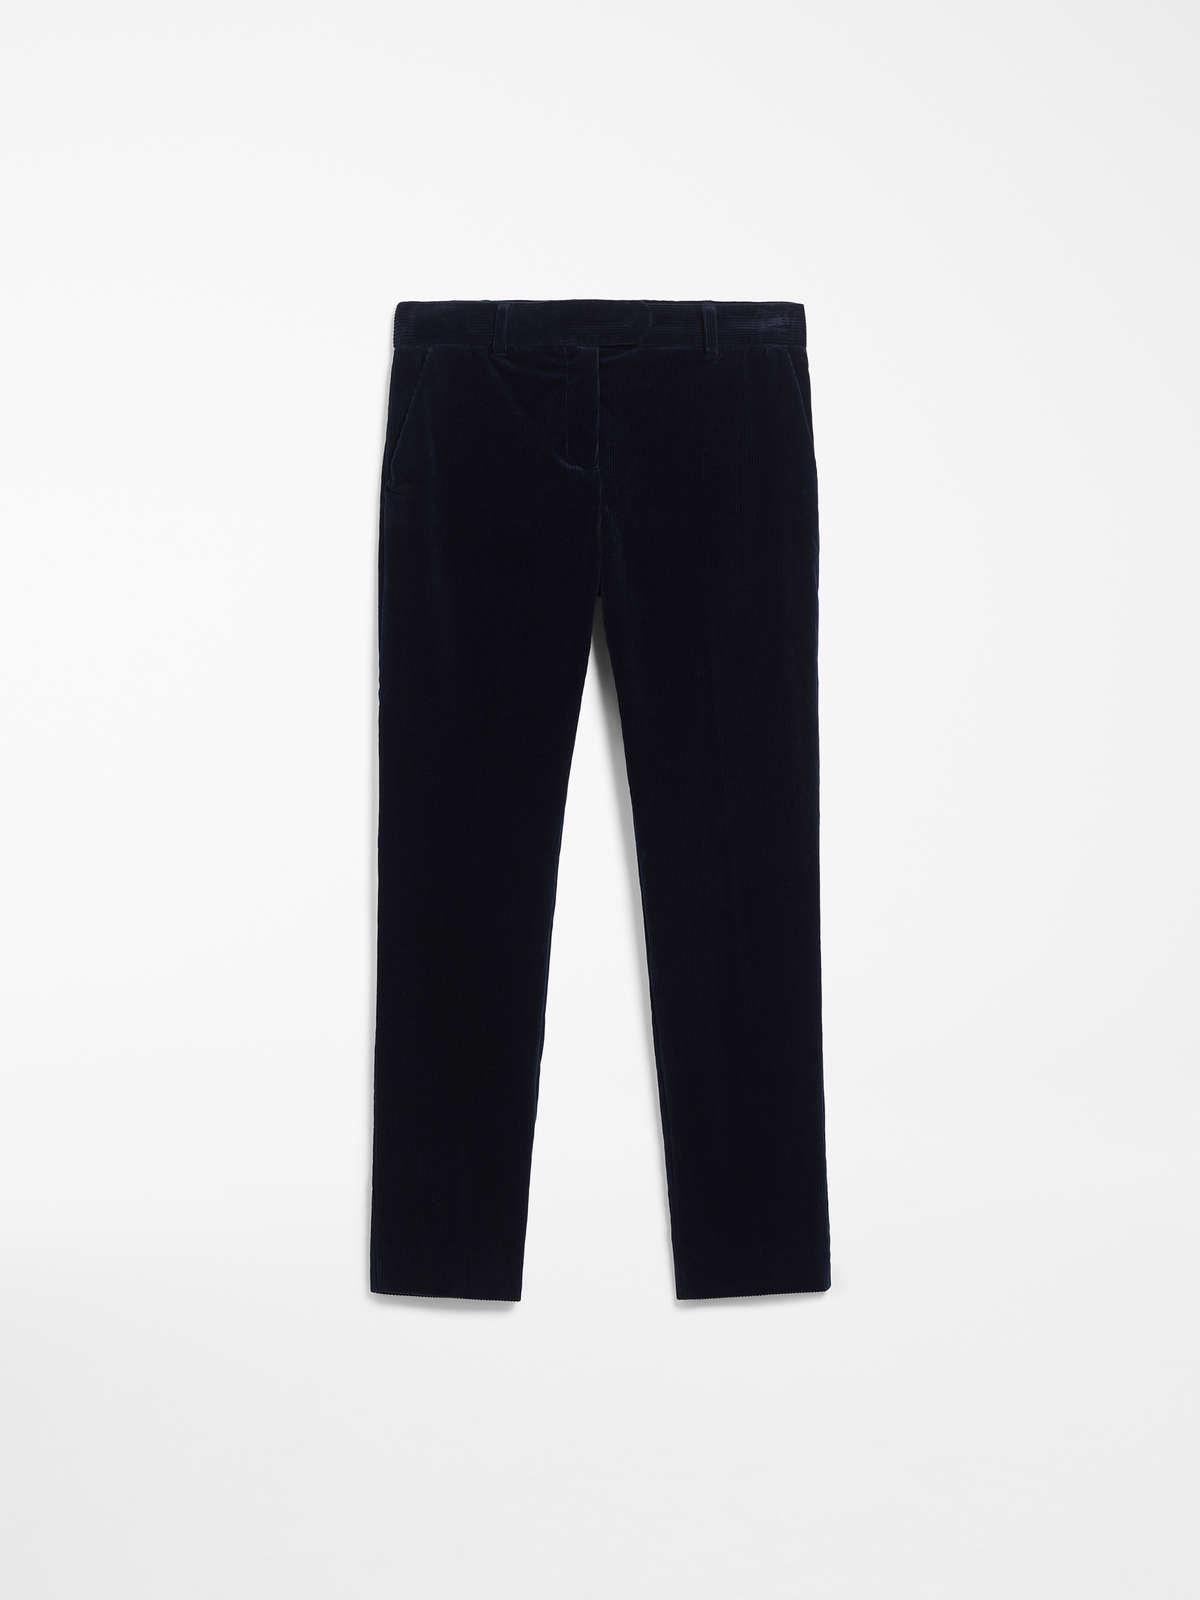 Corduroy Trousers by Max Mara